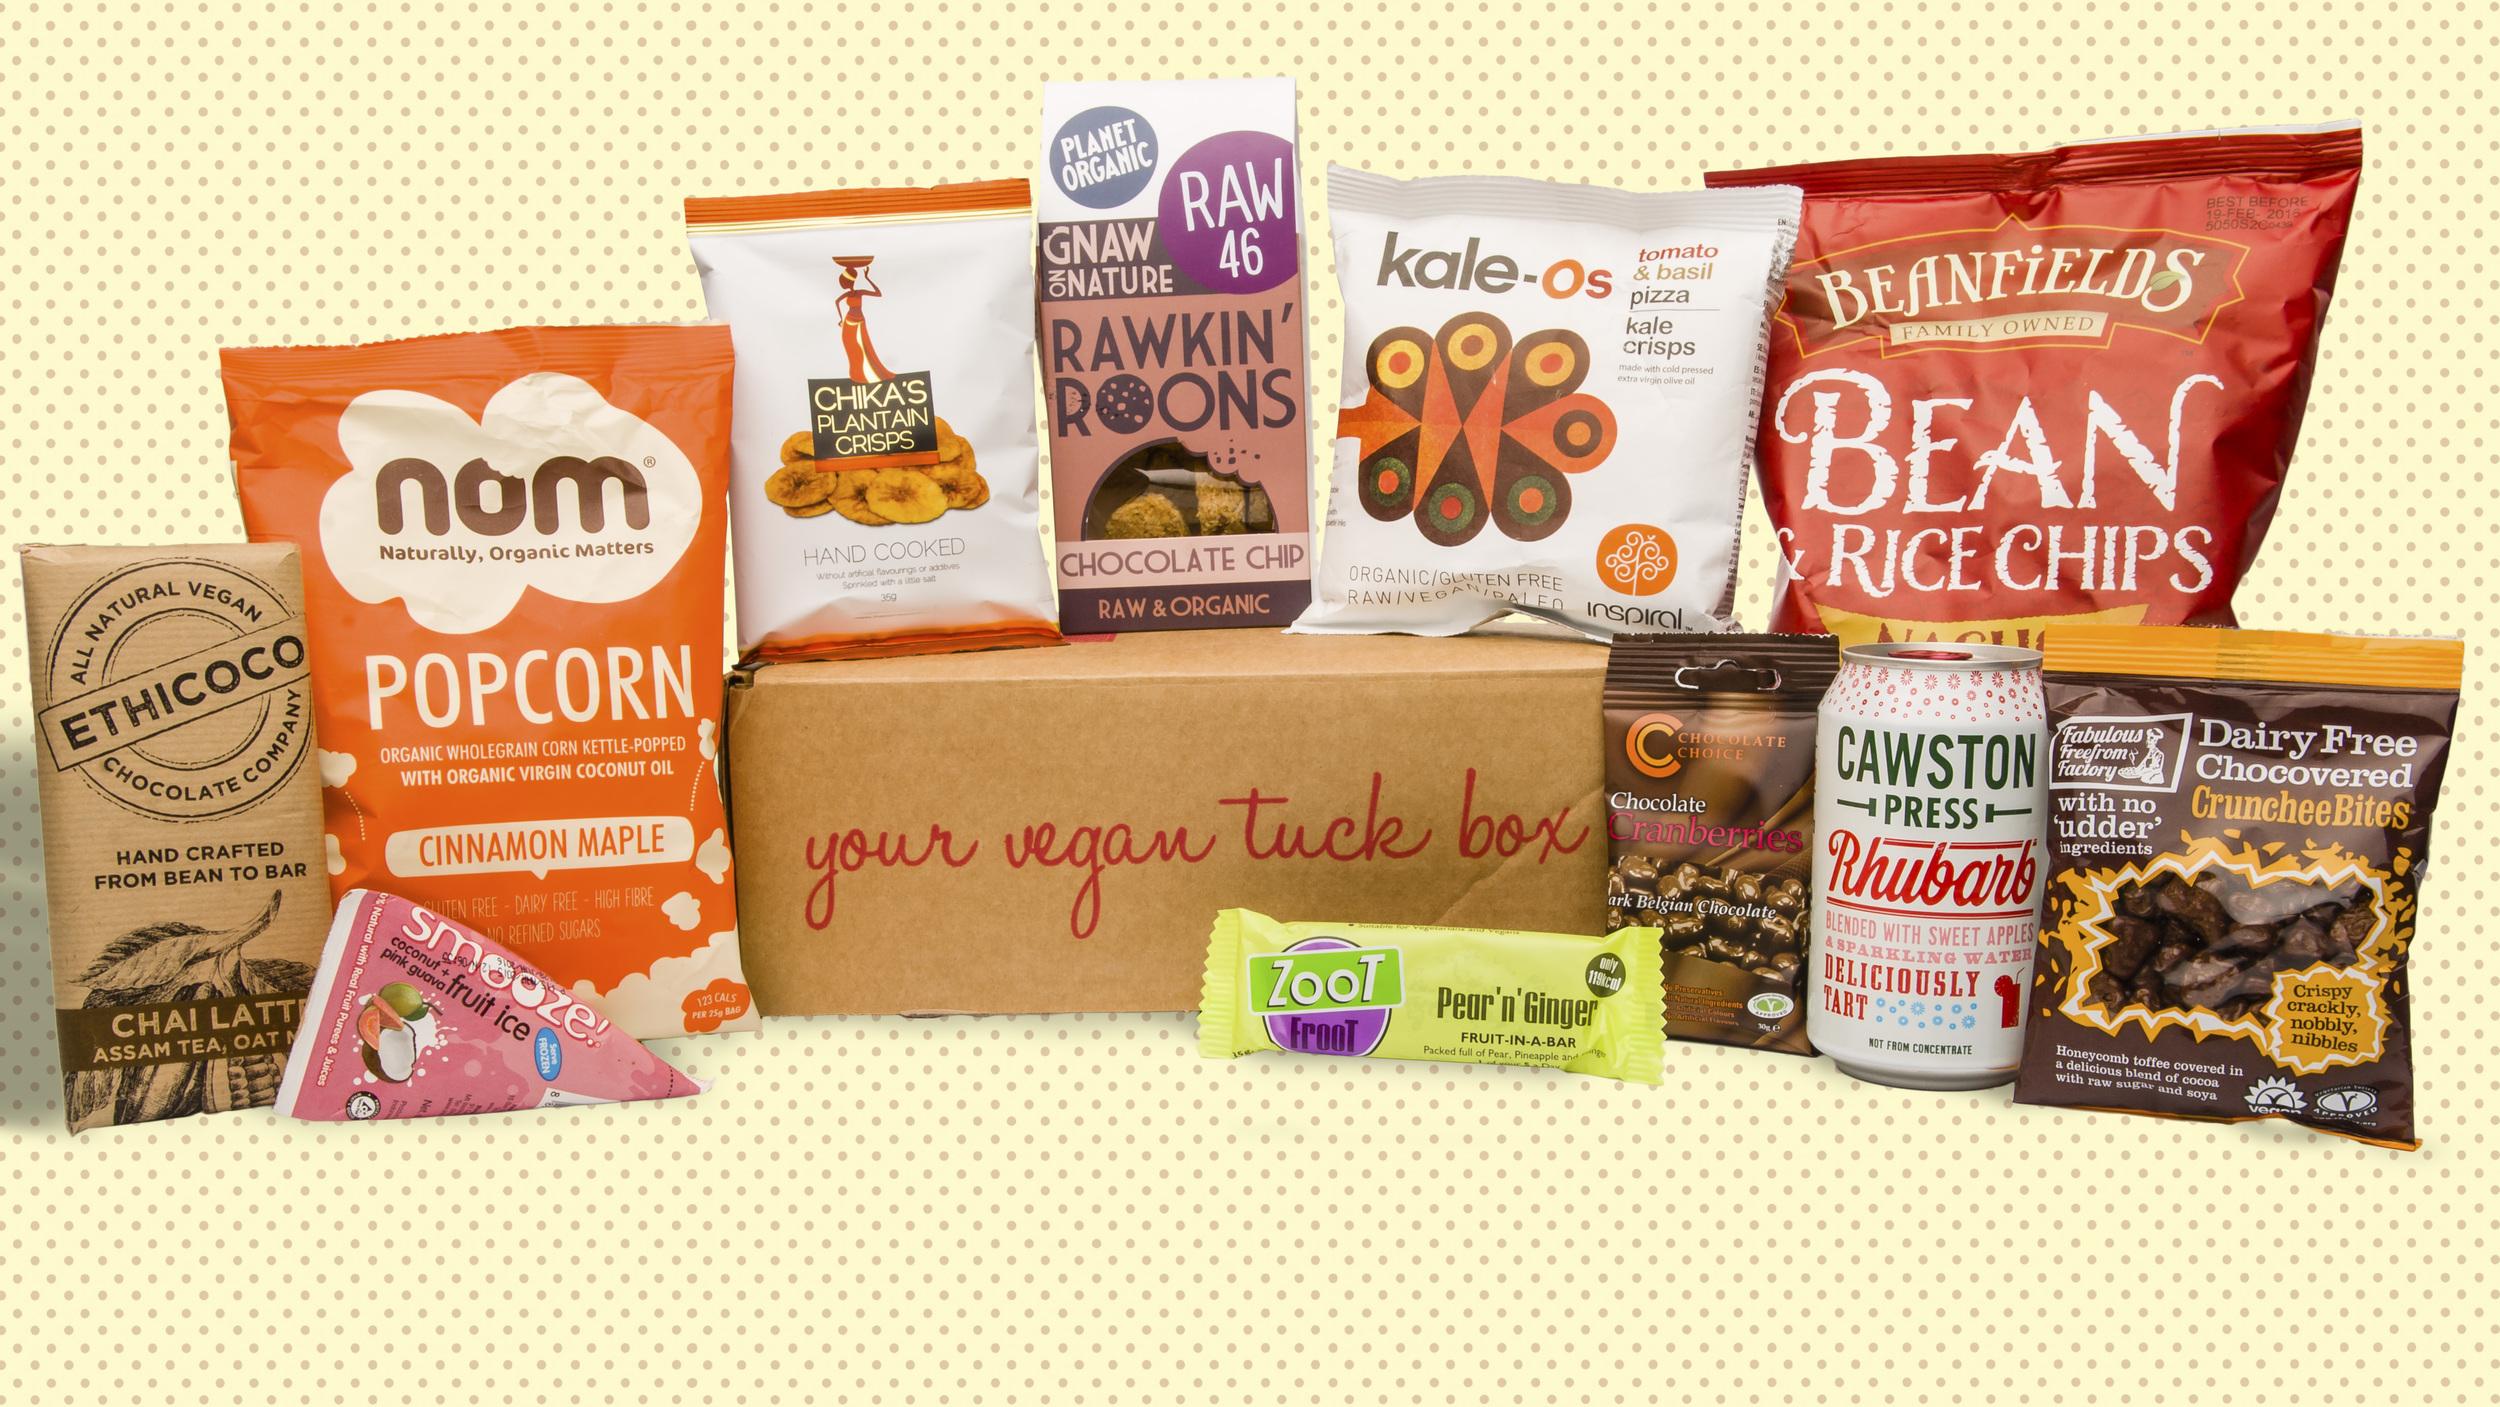 Vegan Tuck Box of August 2015